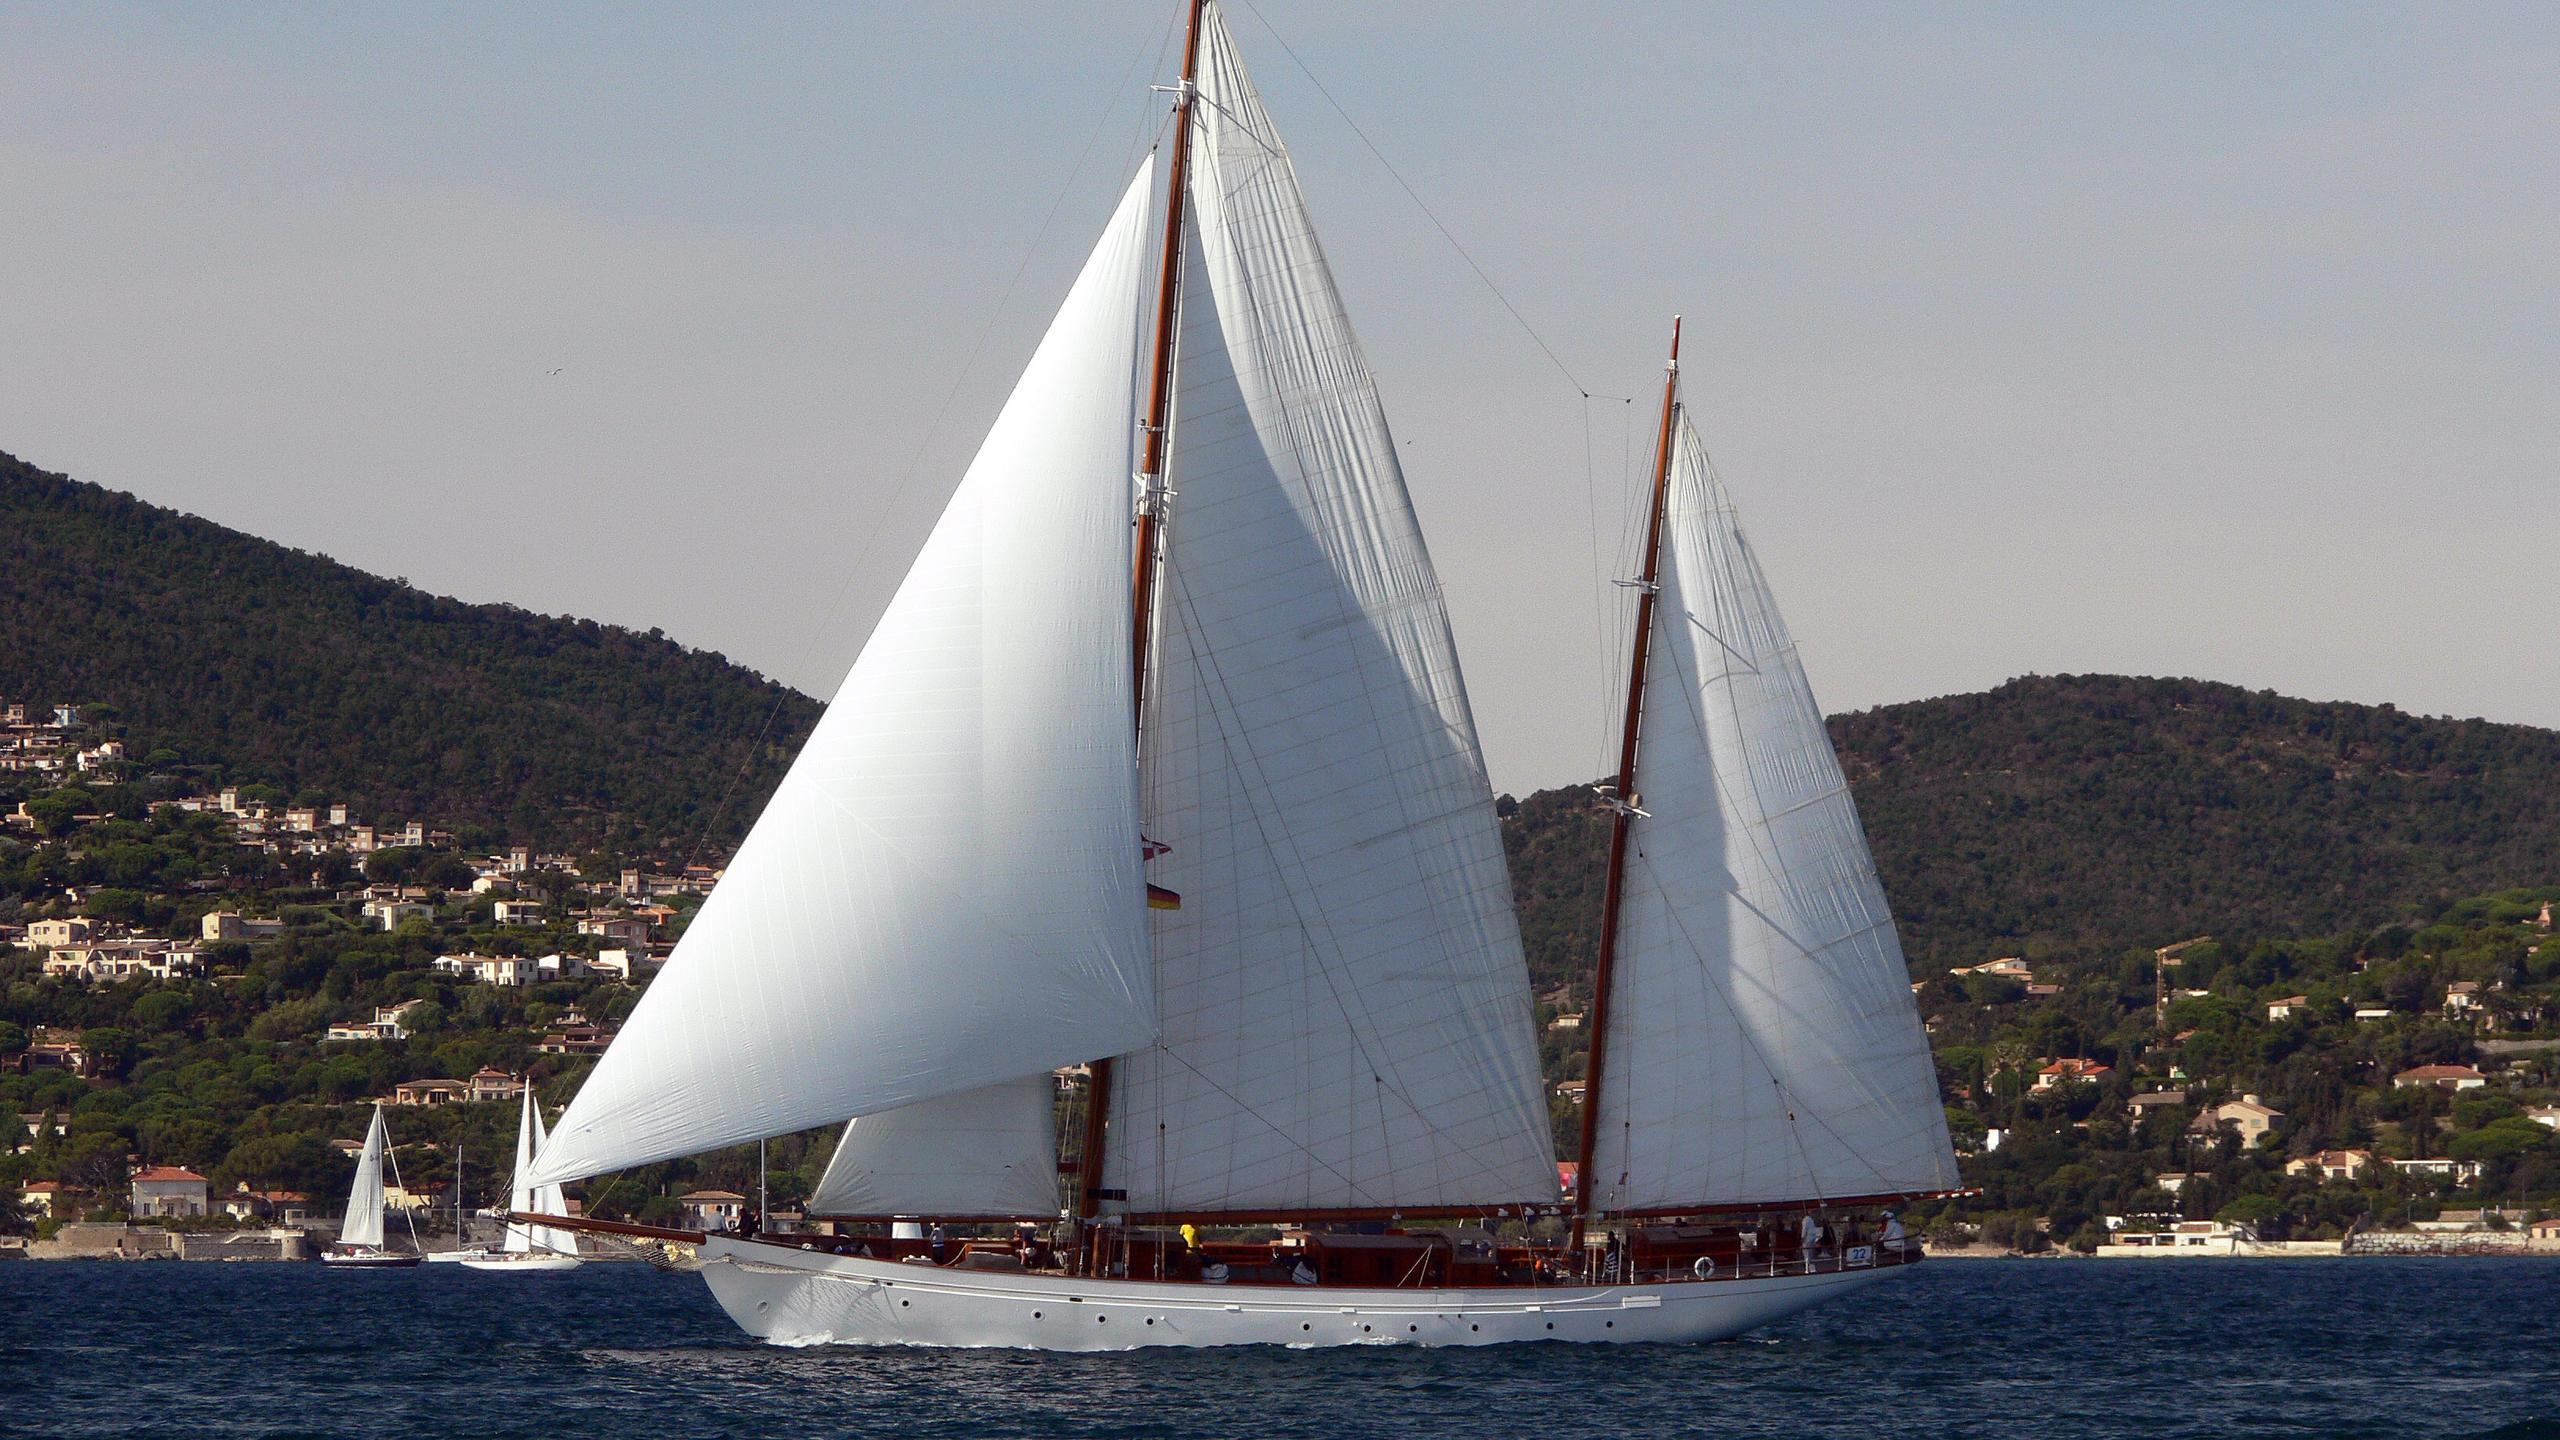 sylvia-sailing-yacht-camper-nicholsons-1925-44m-cruising-profile